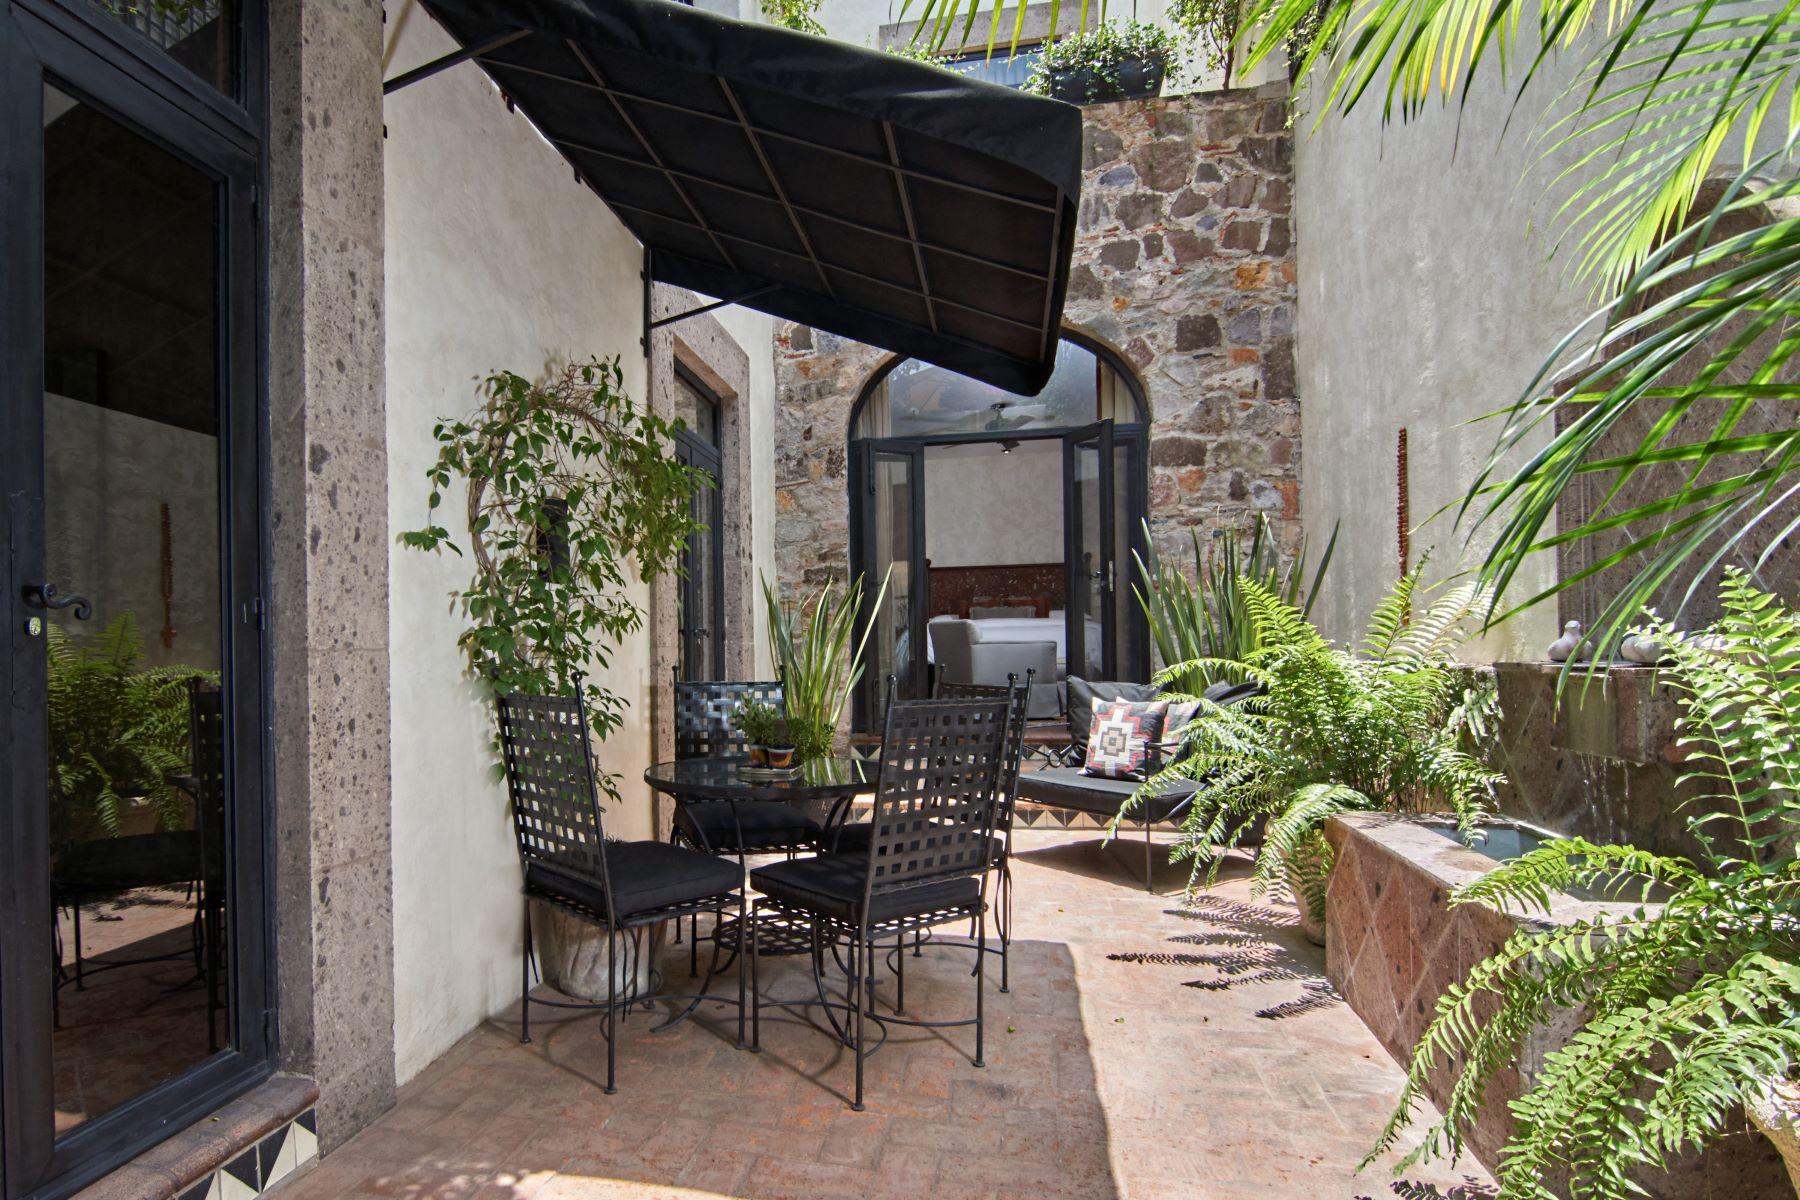 Additional photo for property listing at Casa Corazon Terraplen 36 San Miguel De Allende, Guanajuato 37700 Mexico